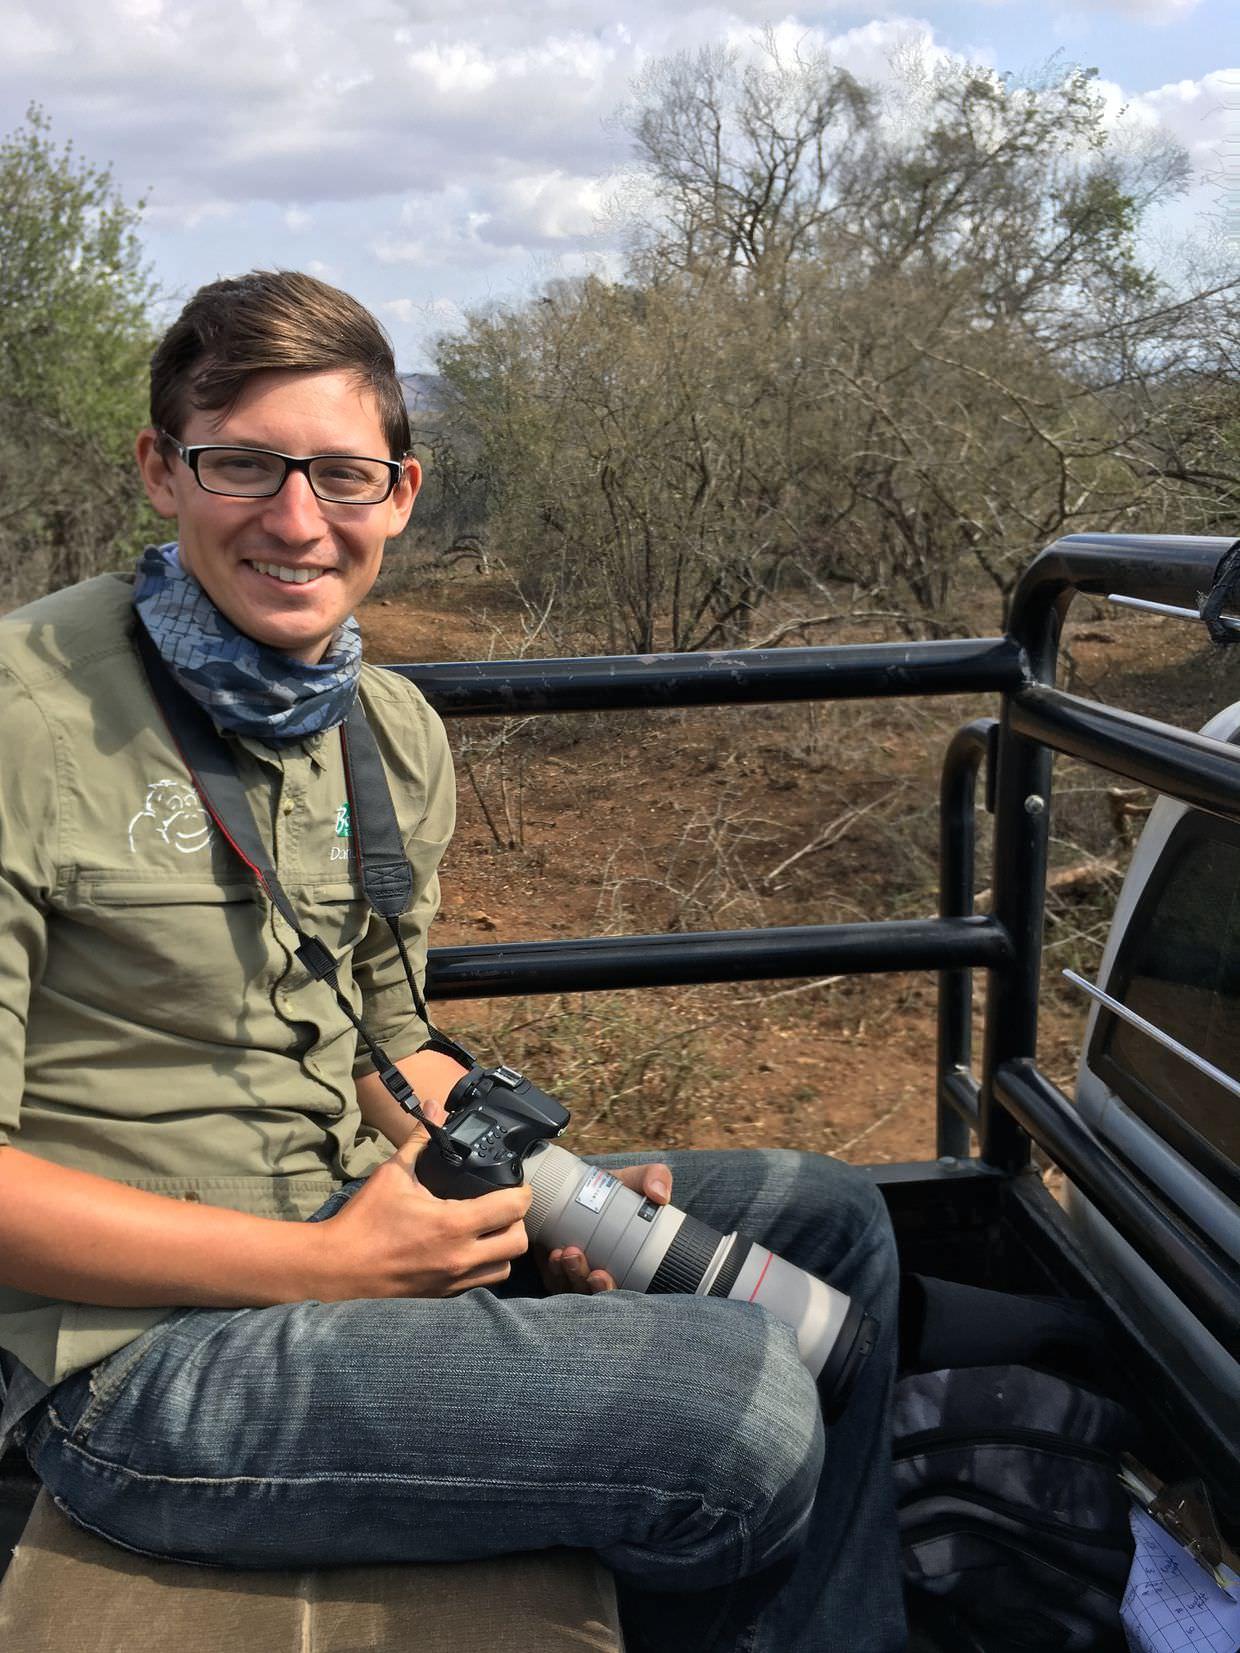 Paul on safari